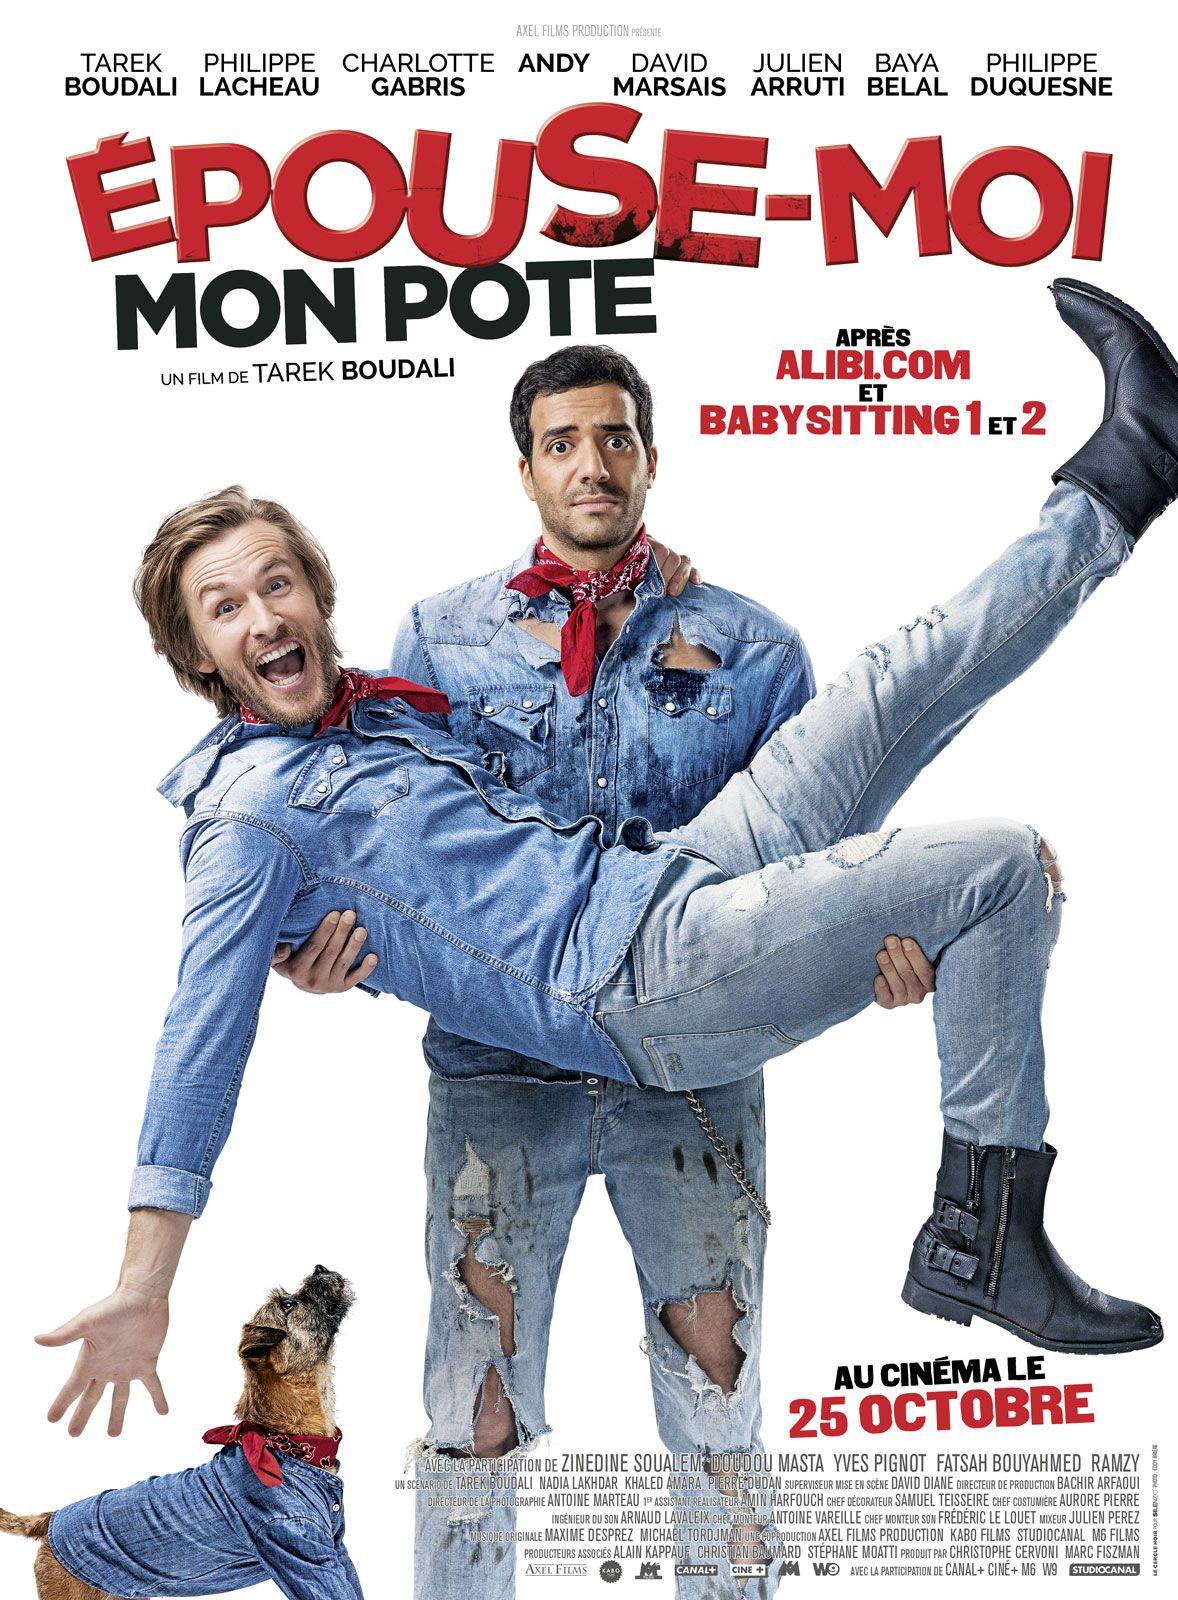 Épouse-moi mon pote - Film (2017)